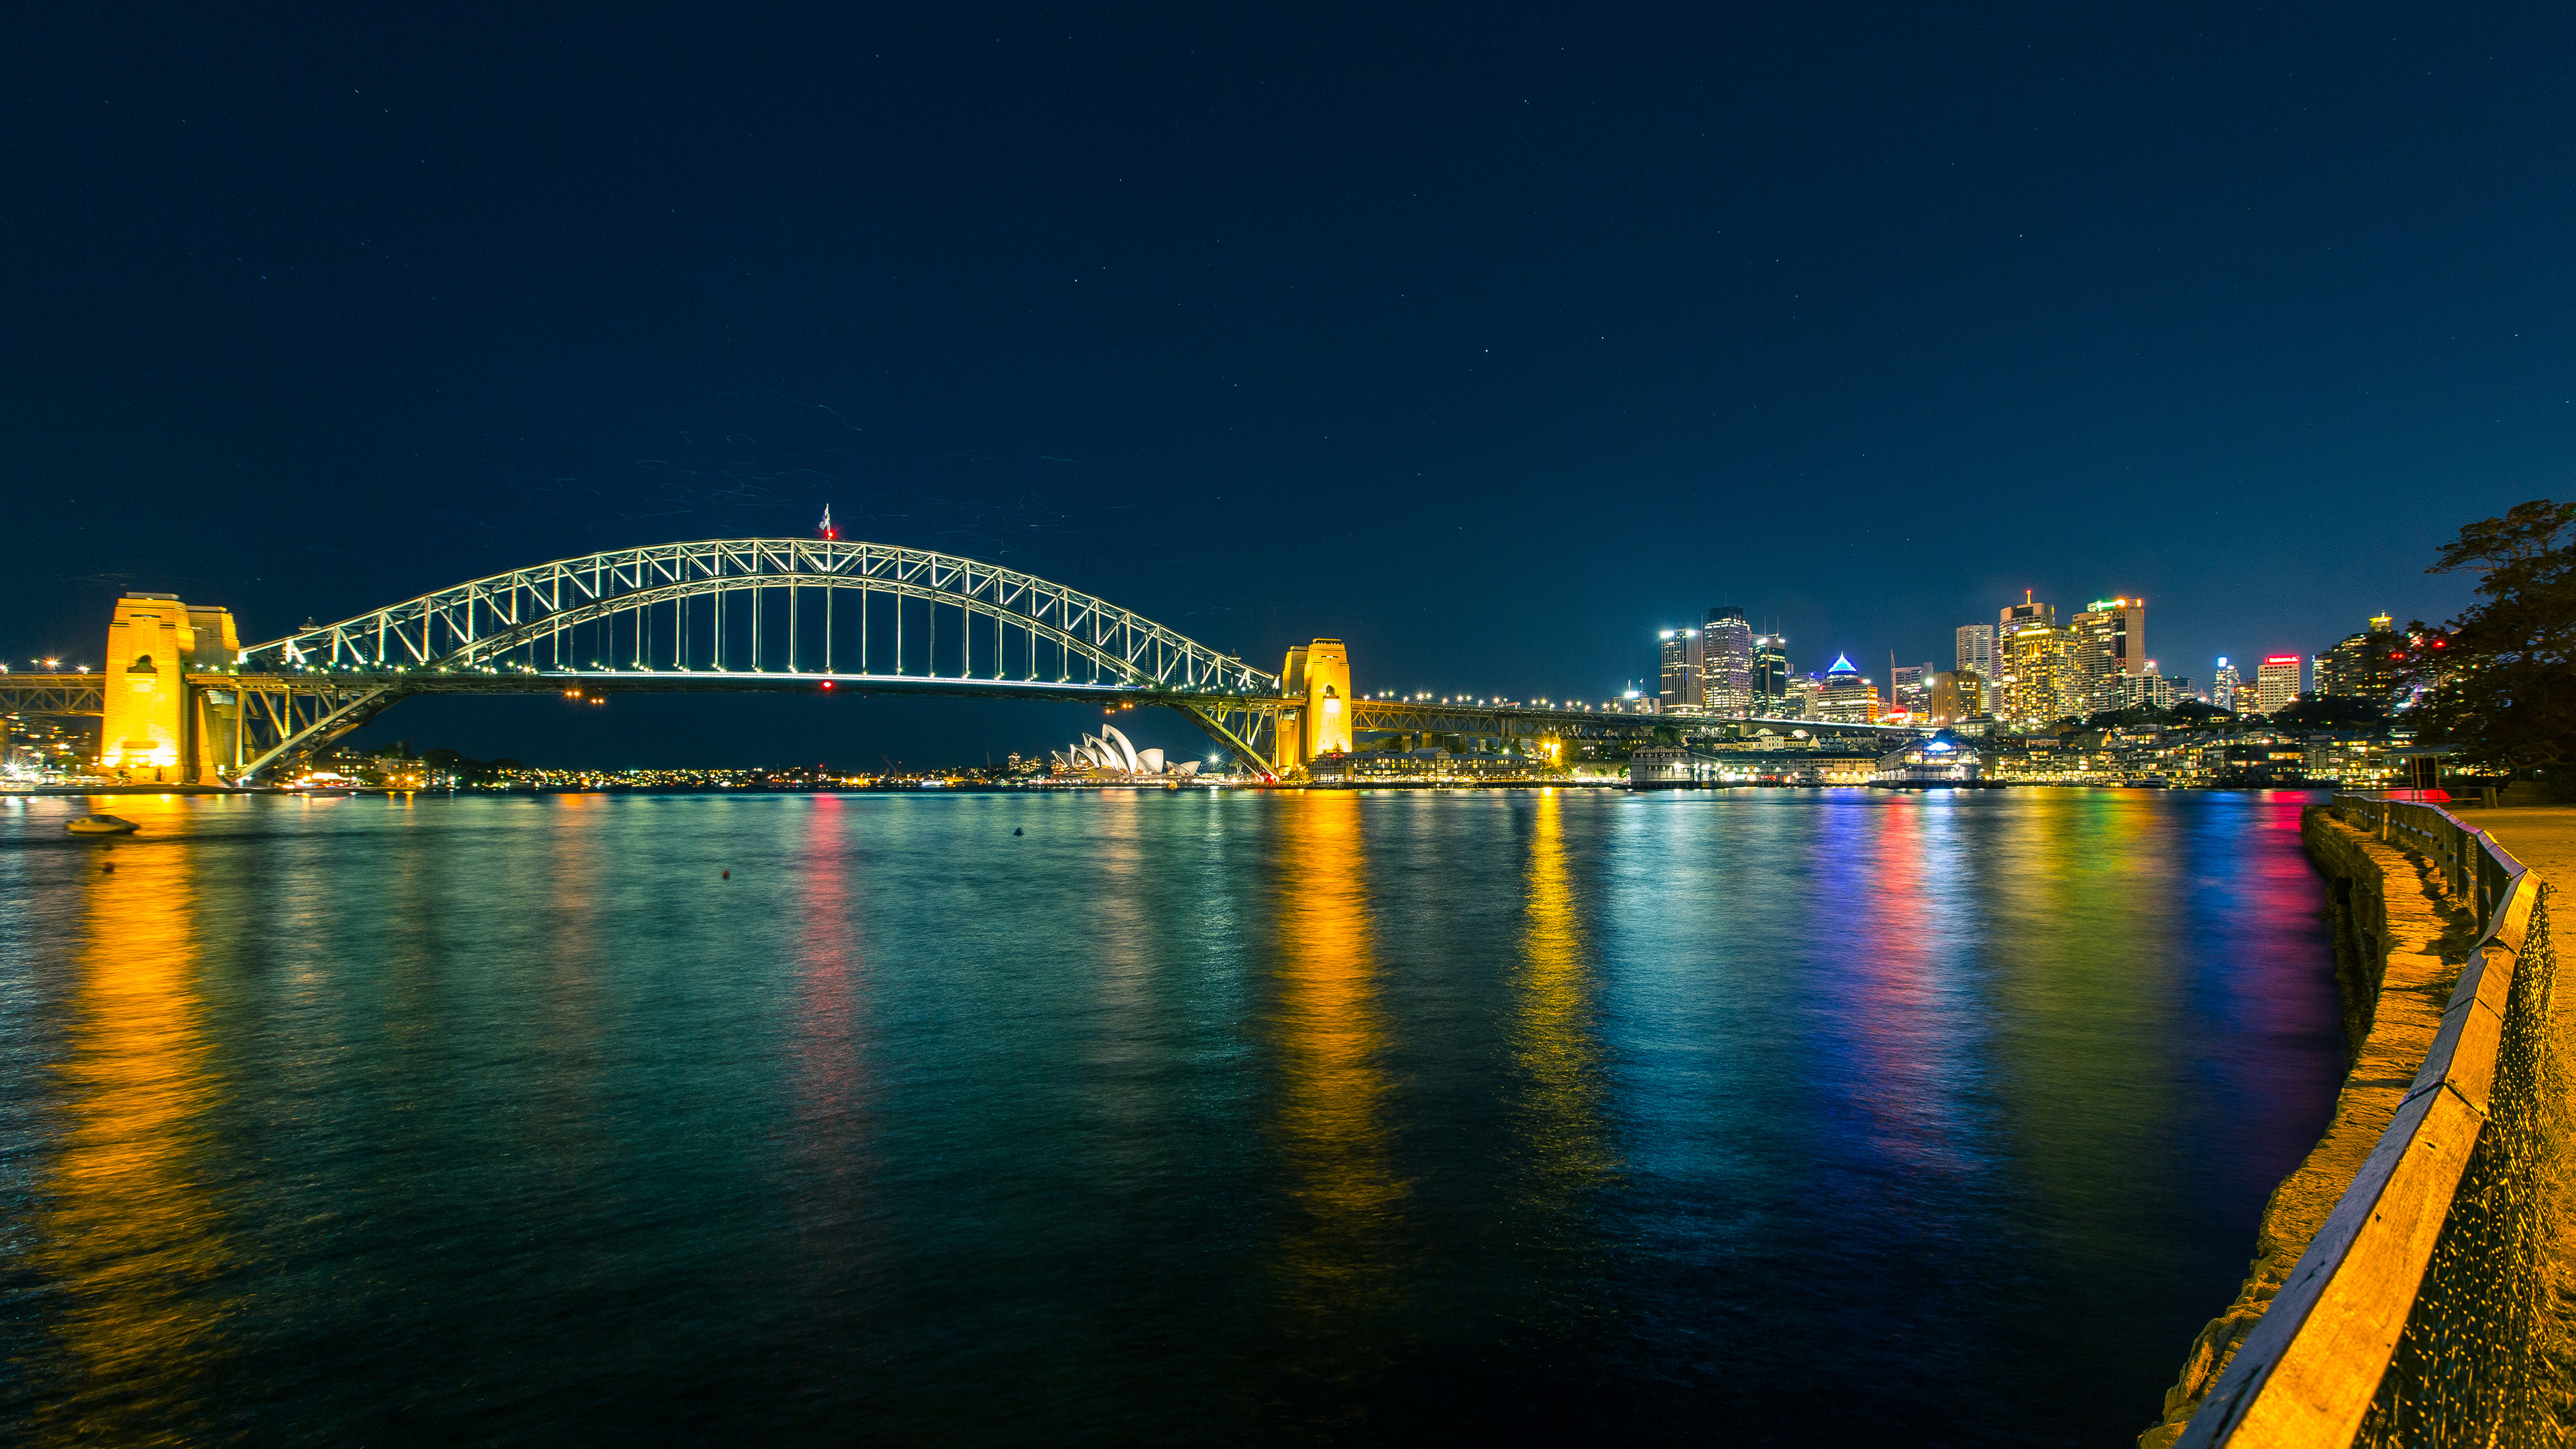 Man Made  Sydney Harbour Bridge Wallpaper